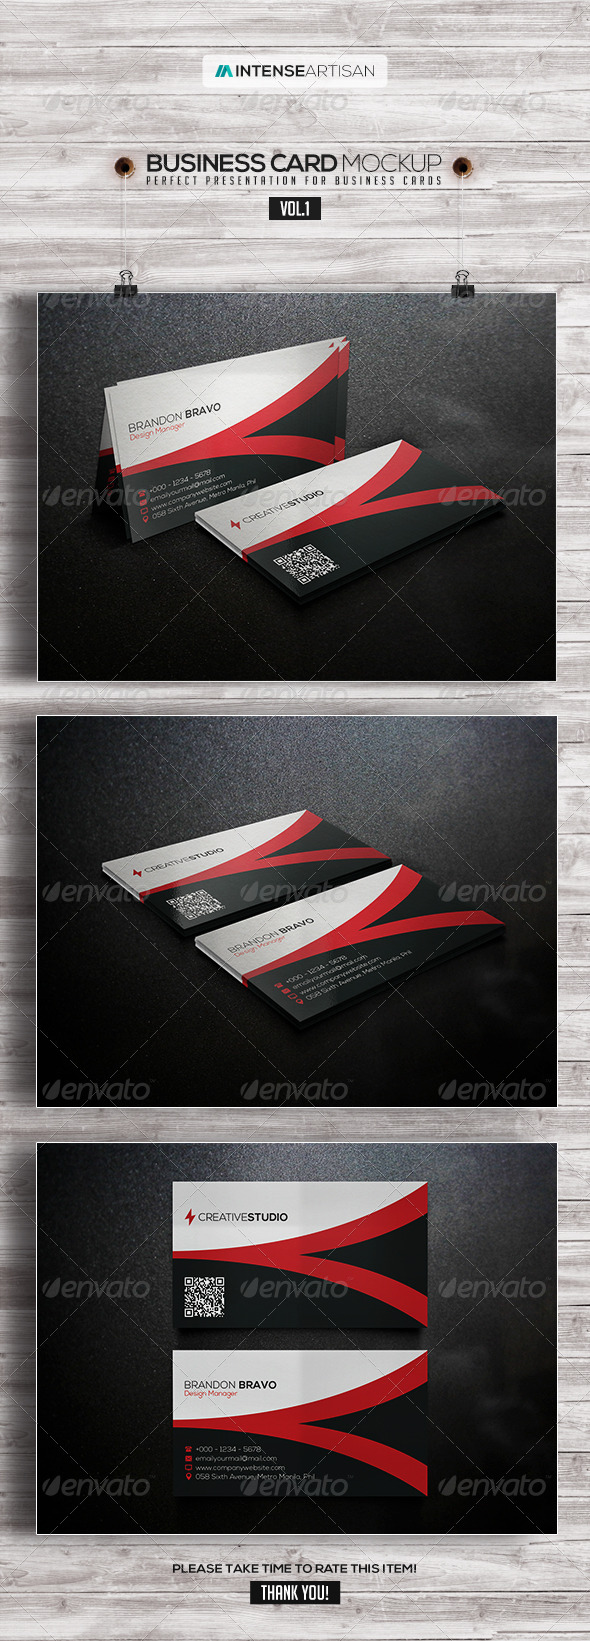 GraphicRiver Business Card Mockup V.1 7920445